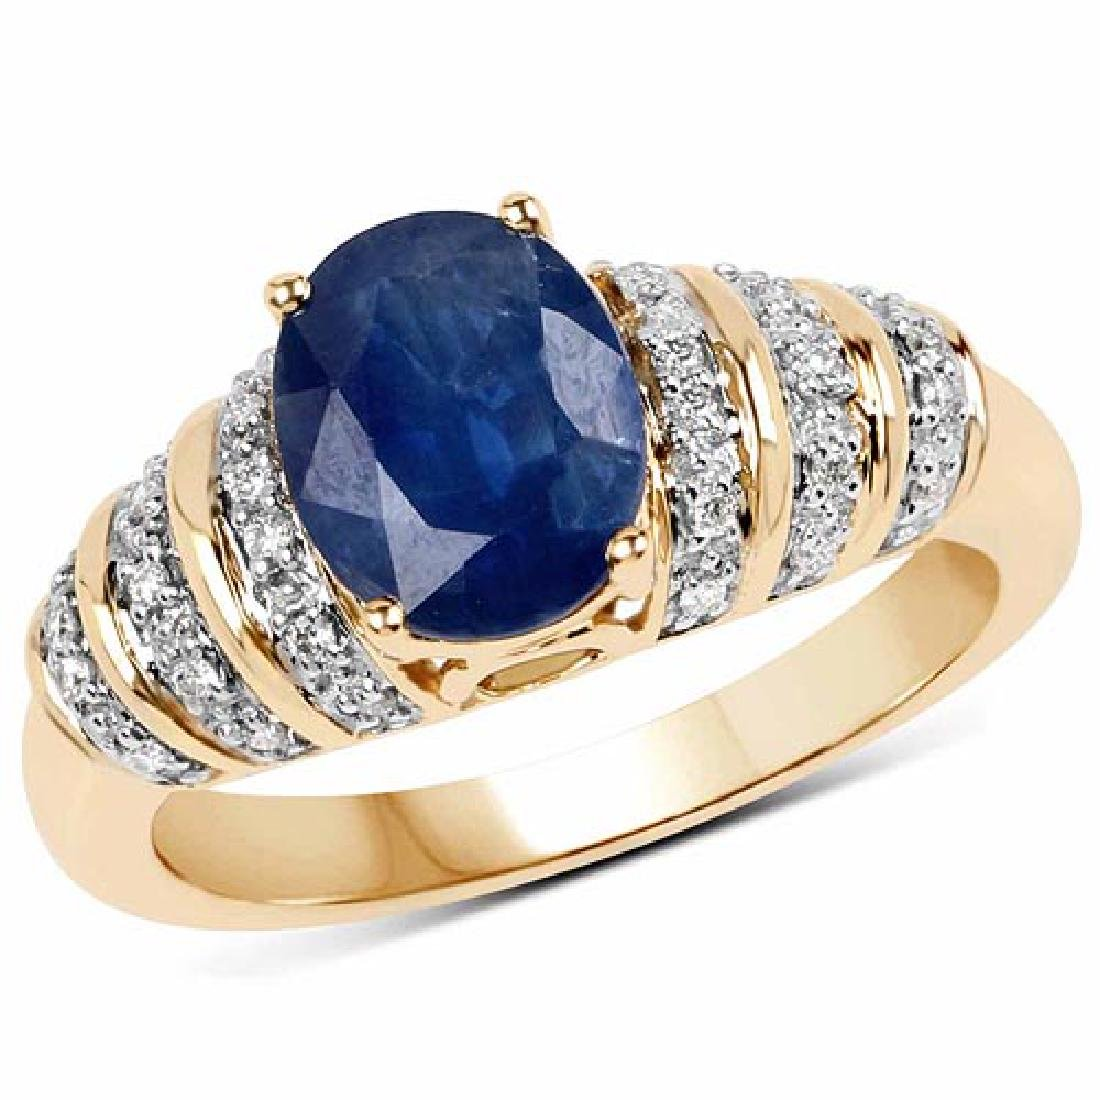 2.11 Carat Genuine Blue Sapphire and White Diamond 14K